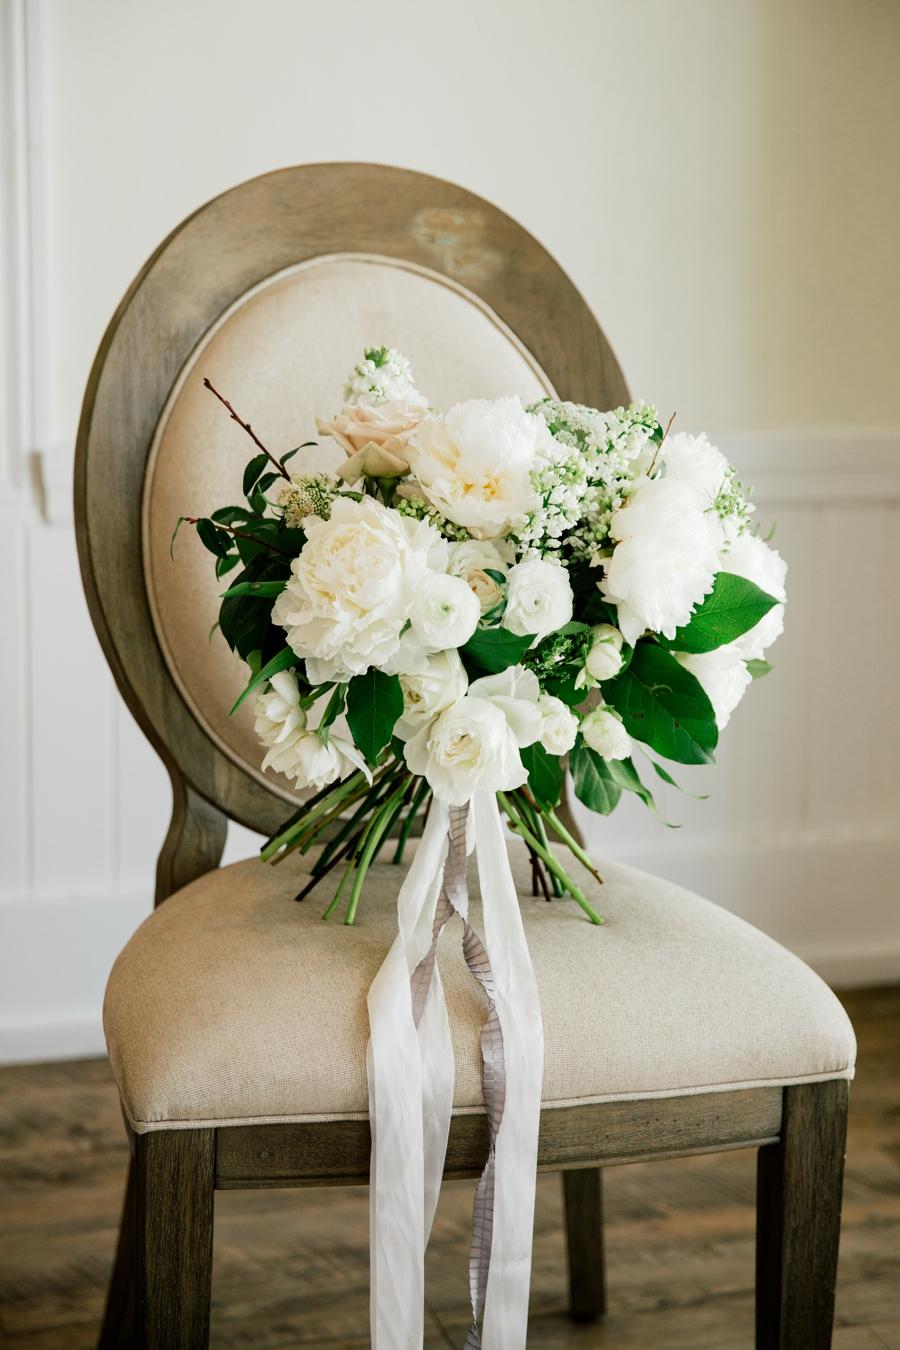 South_Seas_Island_Resort_Destination_Wedding_Planner_Captiva_Sanibel_Weddings_1758.jpg